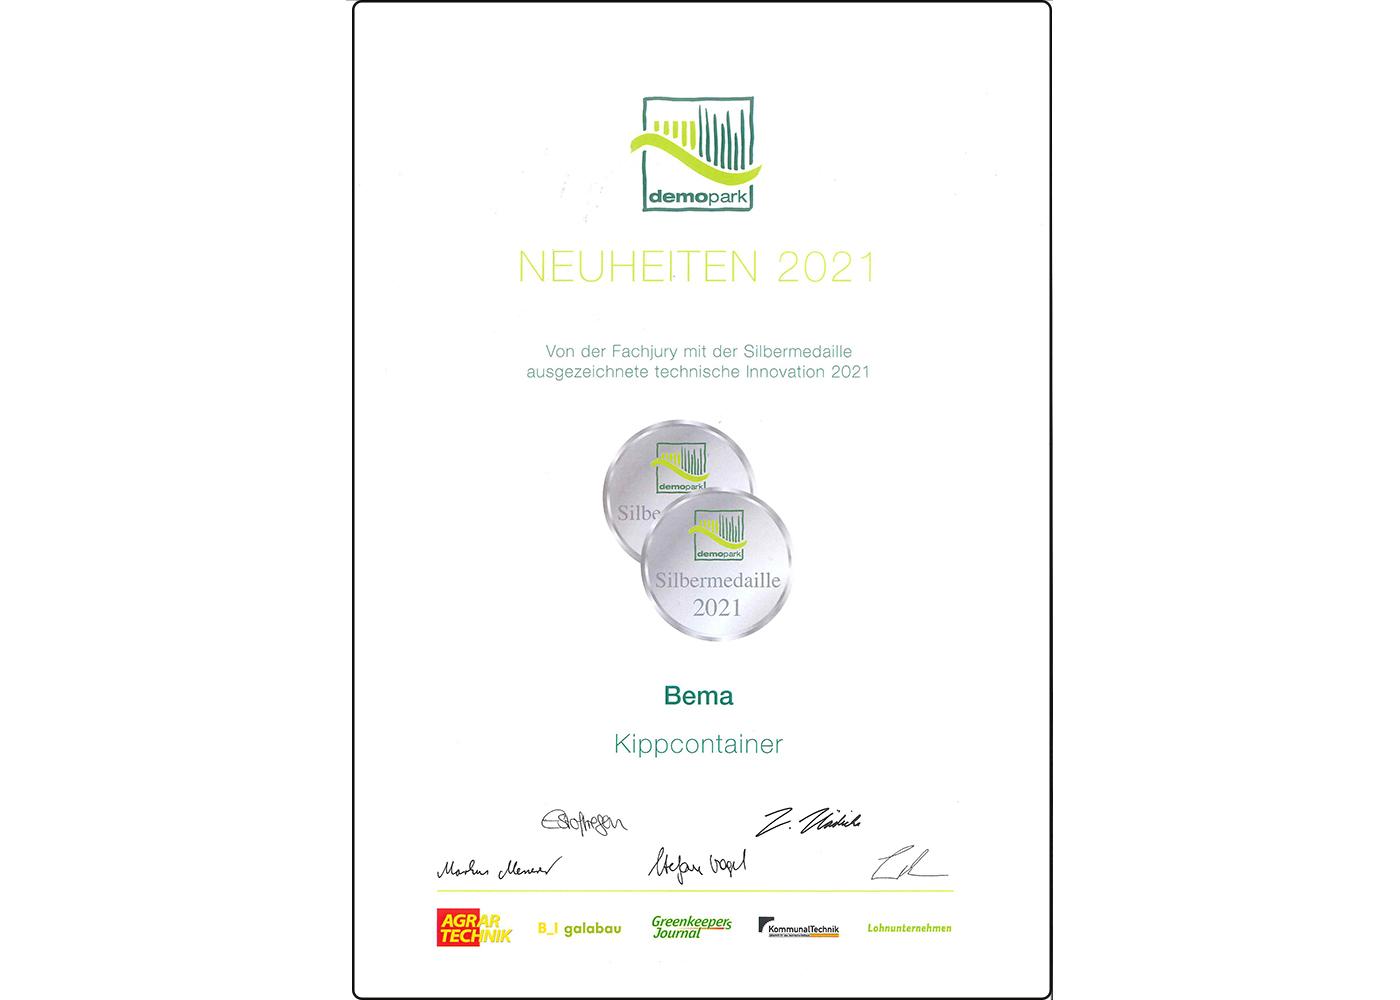 210915_demopark_Urkunde_Silbermedaille_Kippcontainer.jpg